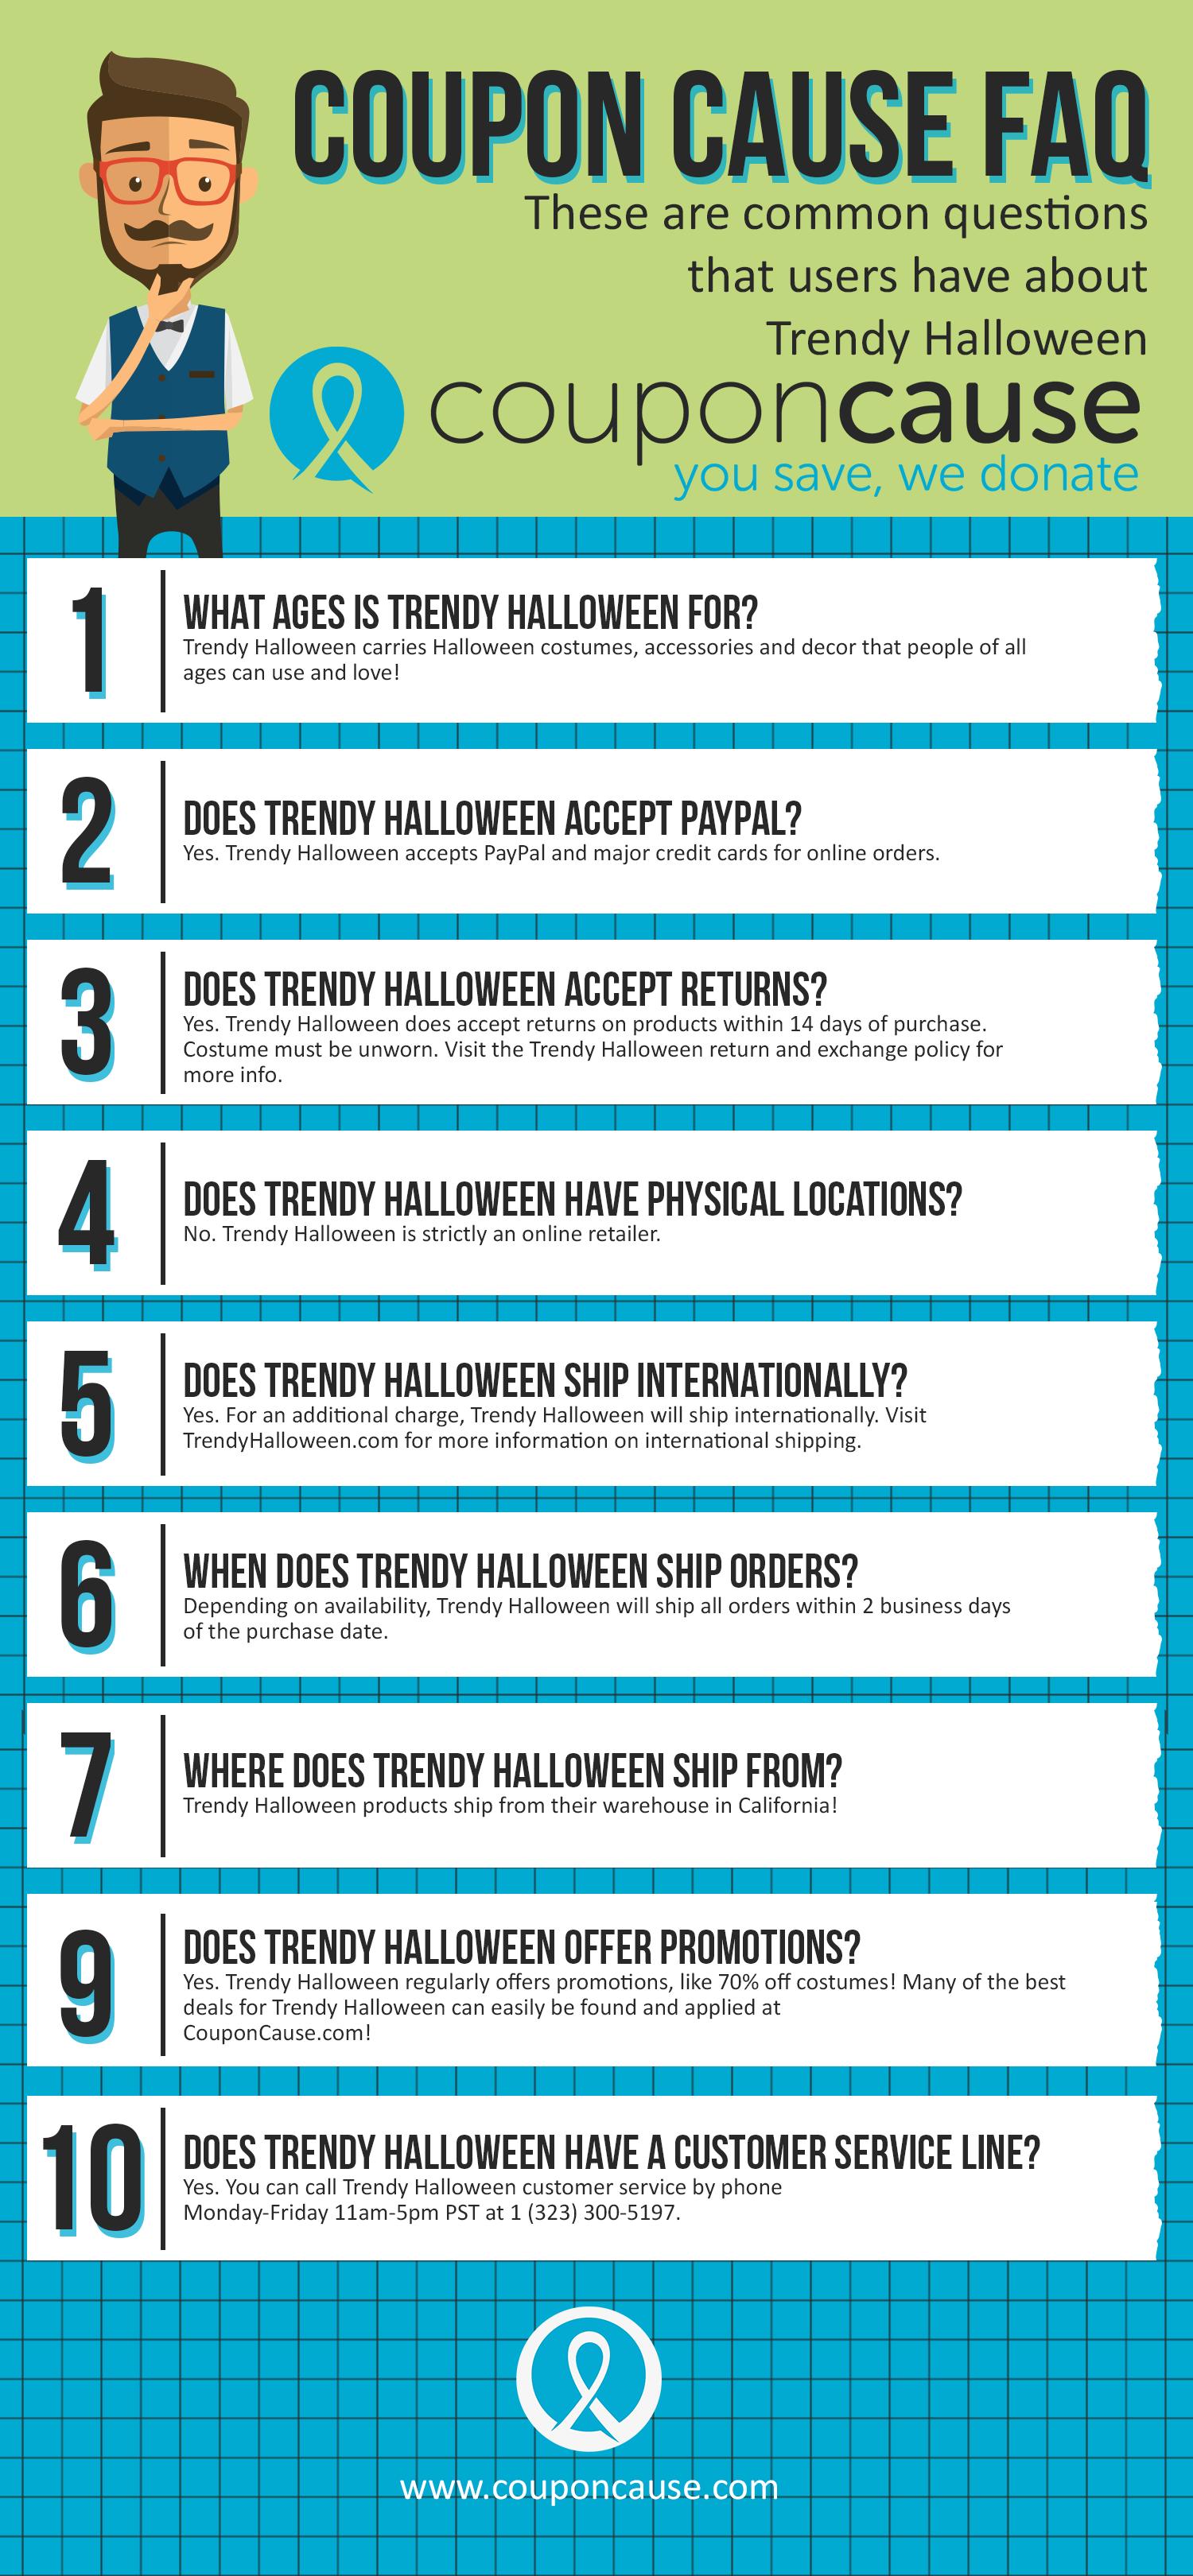 Trendy Halloween Coupon Cause FAQ (C.C. FAQ)